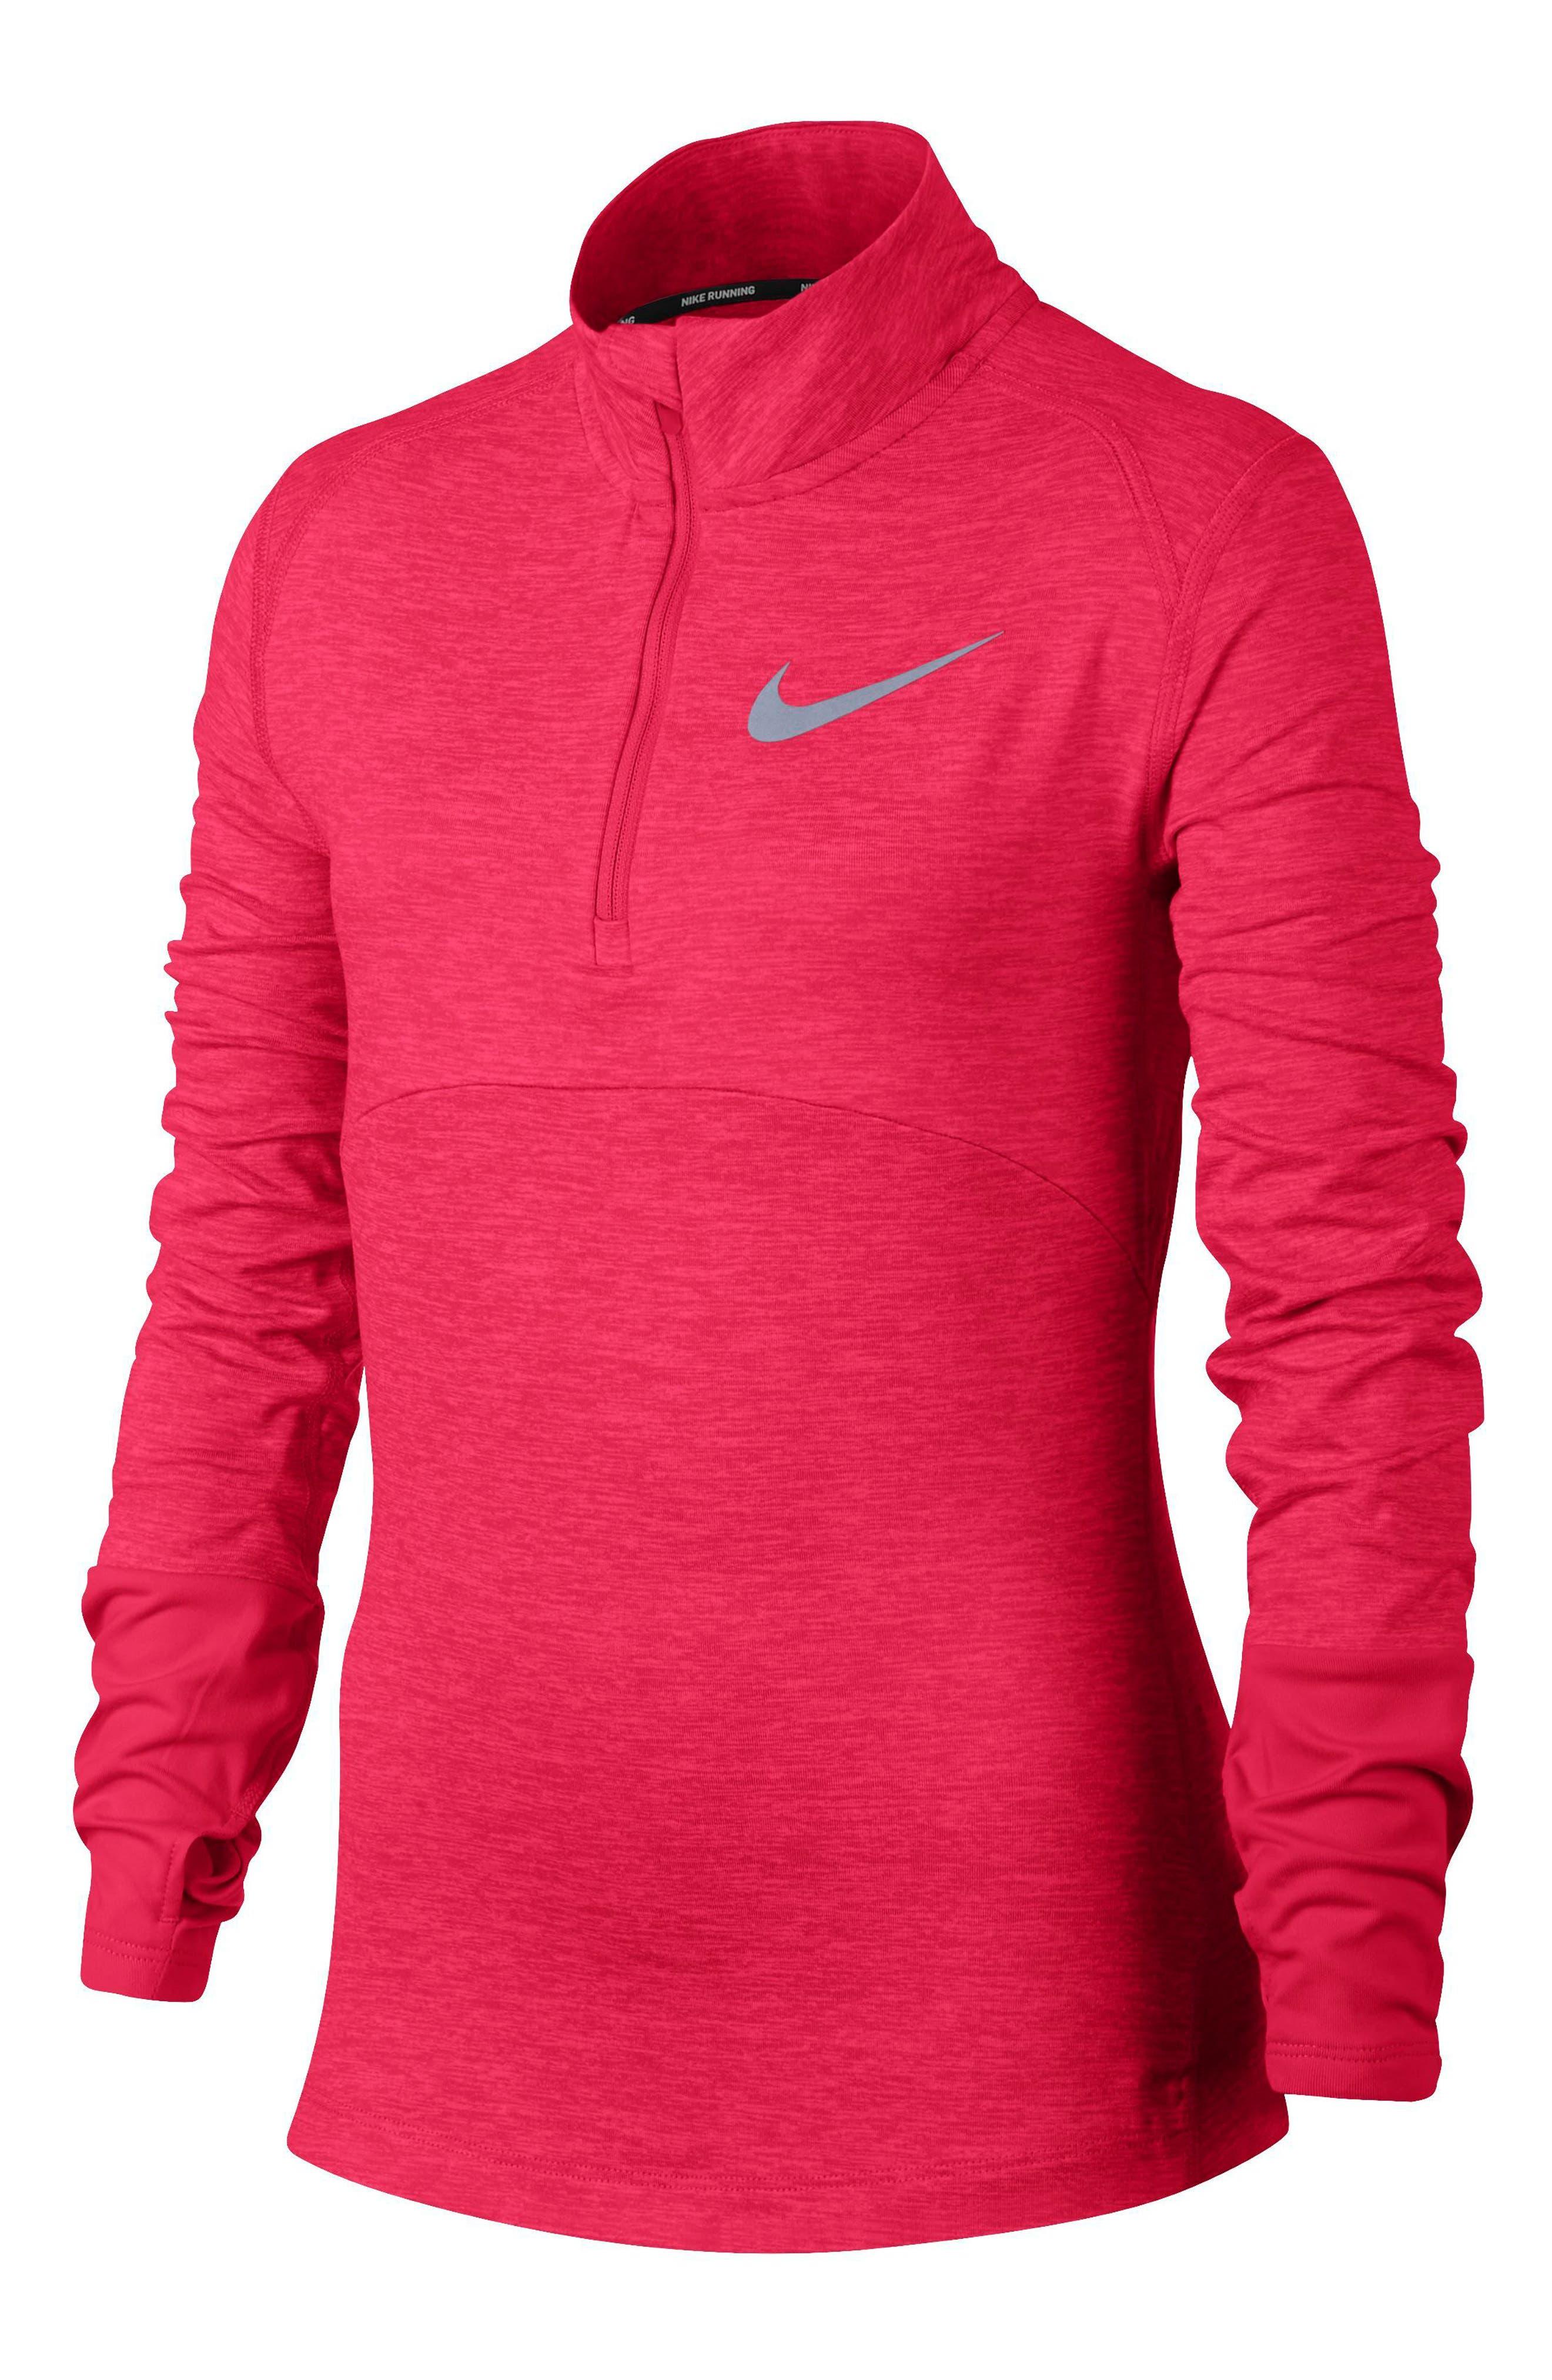 Nike Dry Element Running Top (Big Girls)